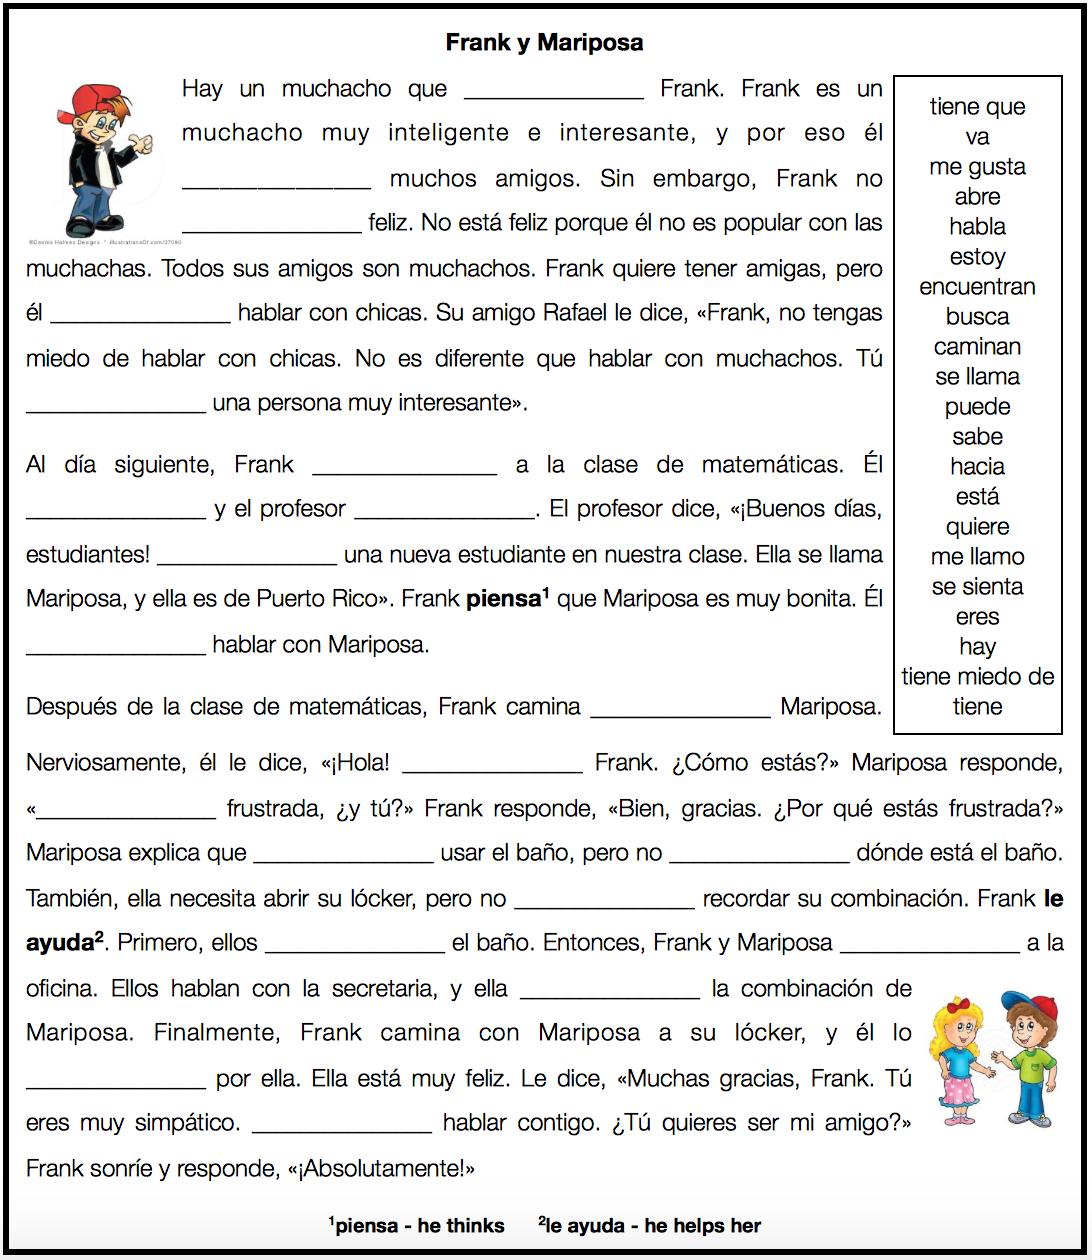 Spanish 1a Midterm By Martina Bex The Comprehensible Classroom  # Muebles Es Hiato O Diptongo